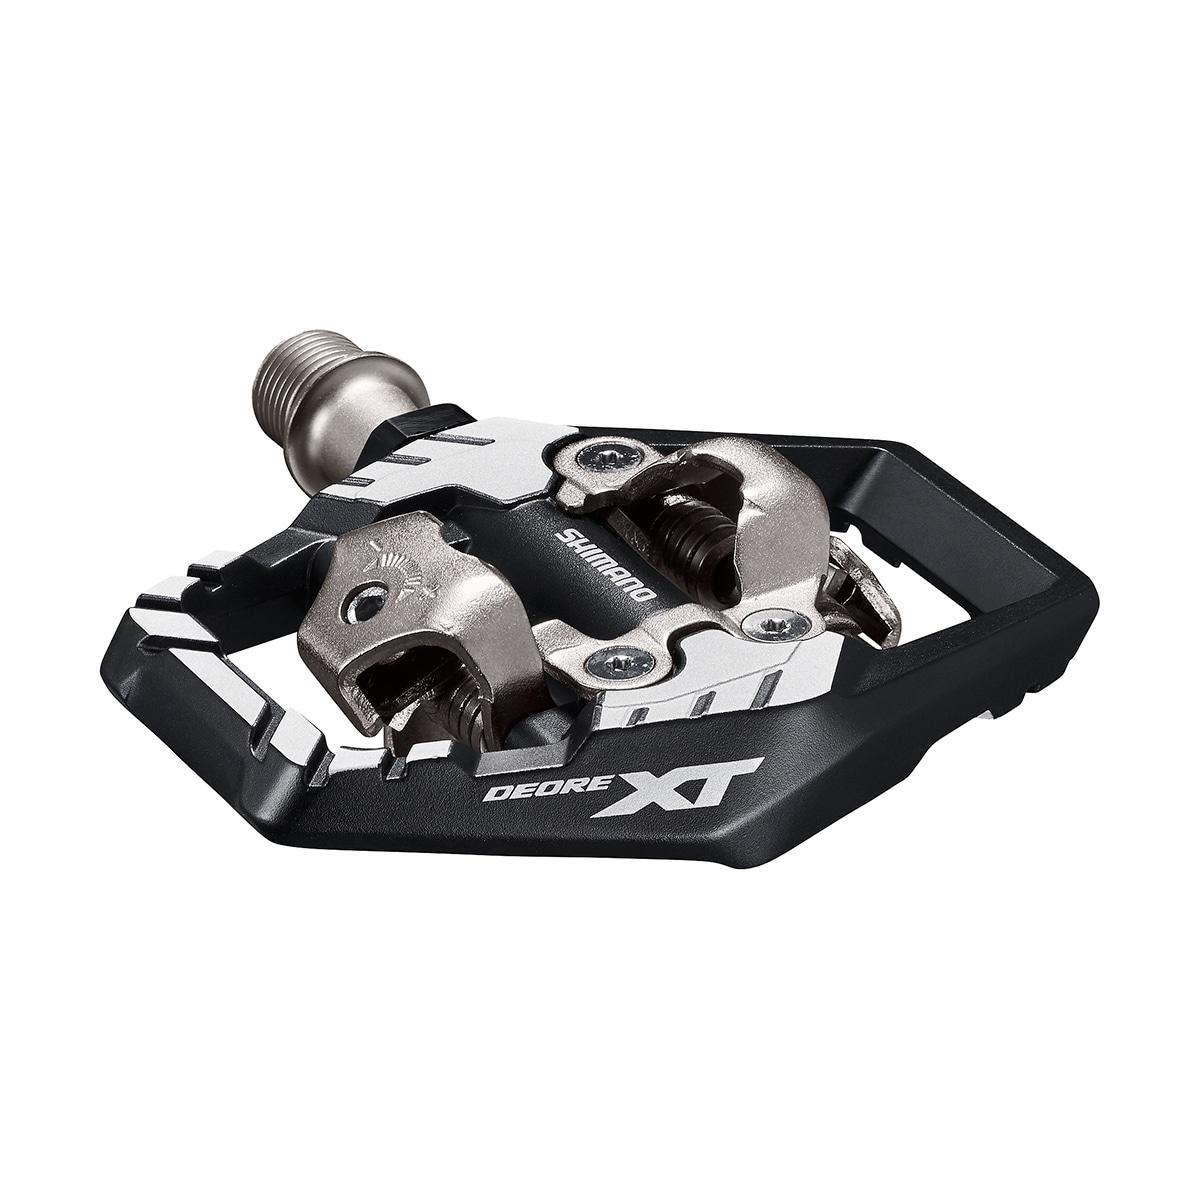 Shimano Pedal, XT M8120, Black